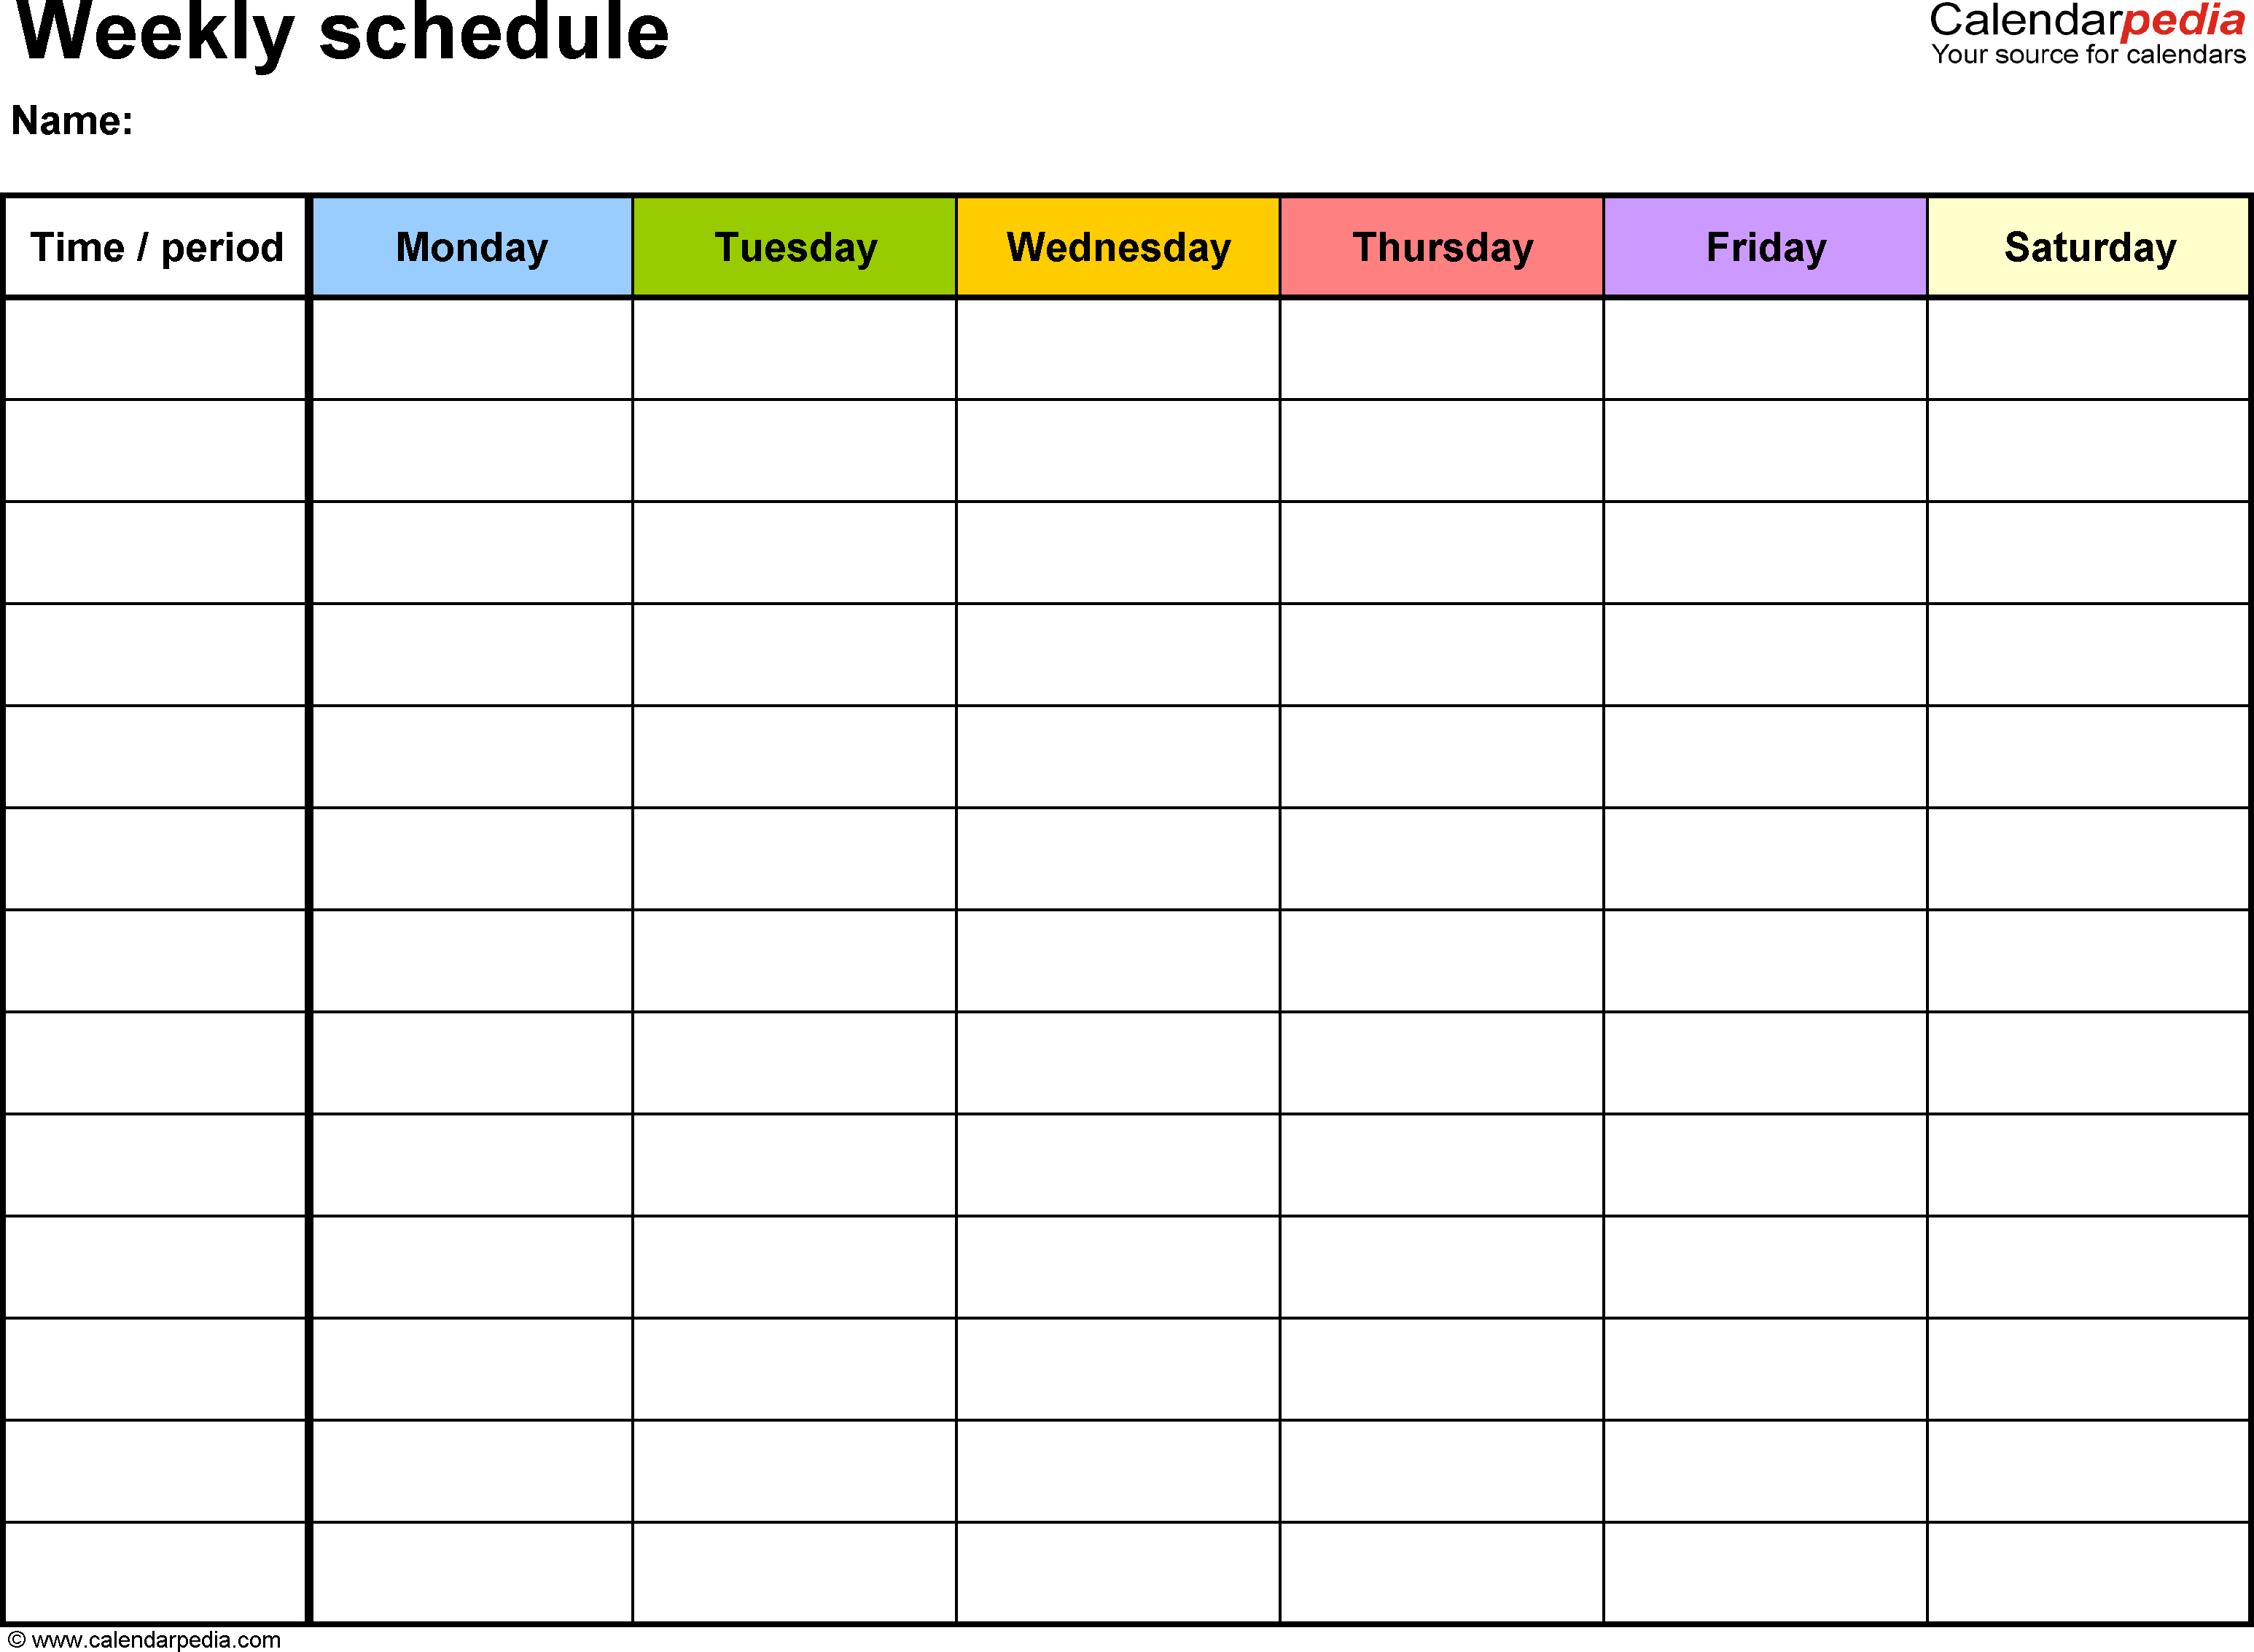 Schedule Template Printable Calendar Maker Custom Timetable - Printable Sign Maker Online Free